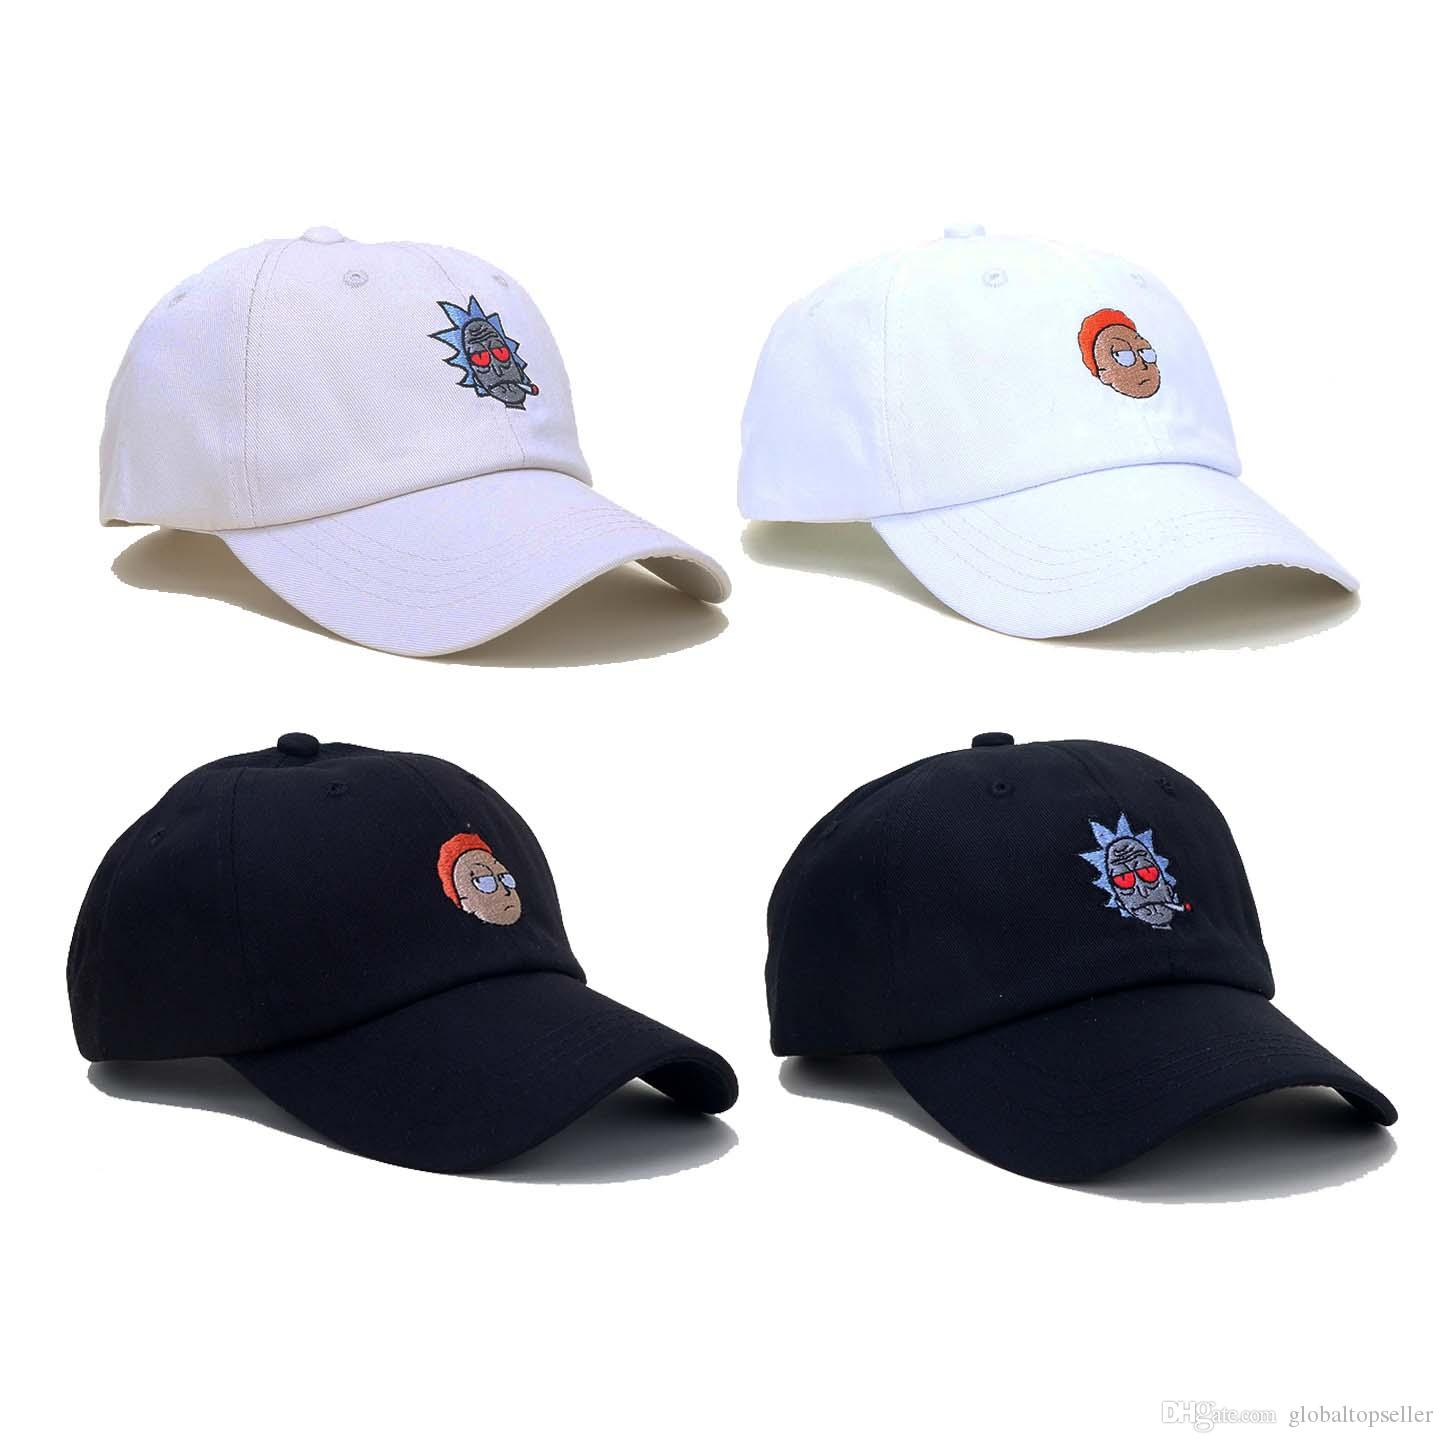 6947b09917a23 ... canada baseball hats baseball caps dad hats zumiez 643e5 6bc73